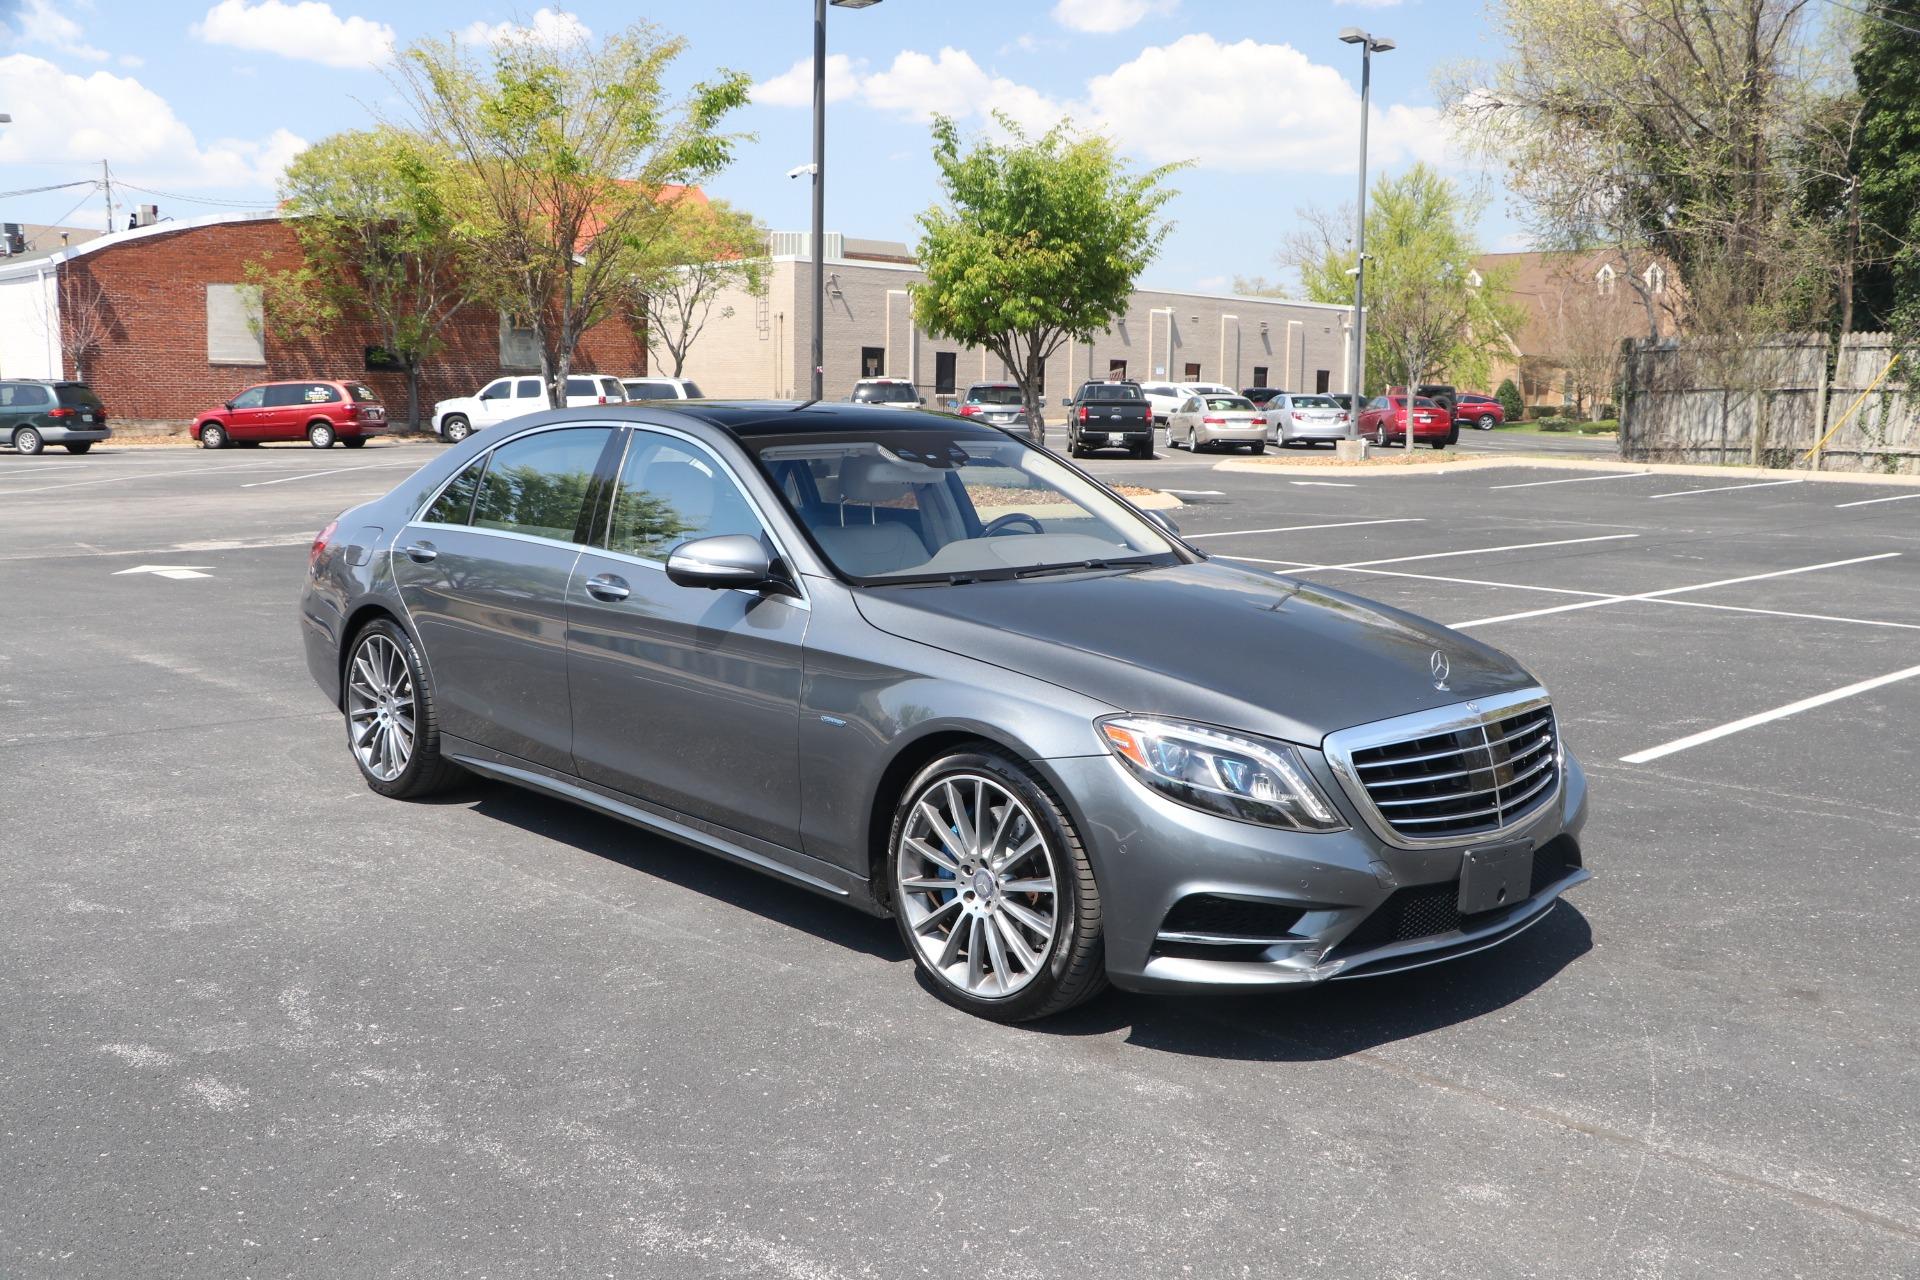 Used 2017 Mercedes-Benz S 550E SPORT W/NAV for sale $45,950 at Auto Collection in Murfreesboro TN 37130 1